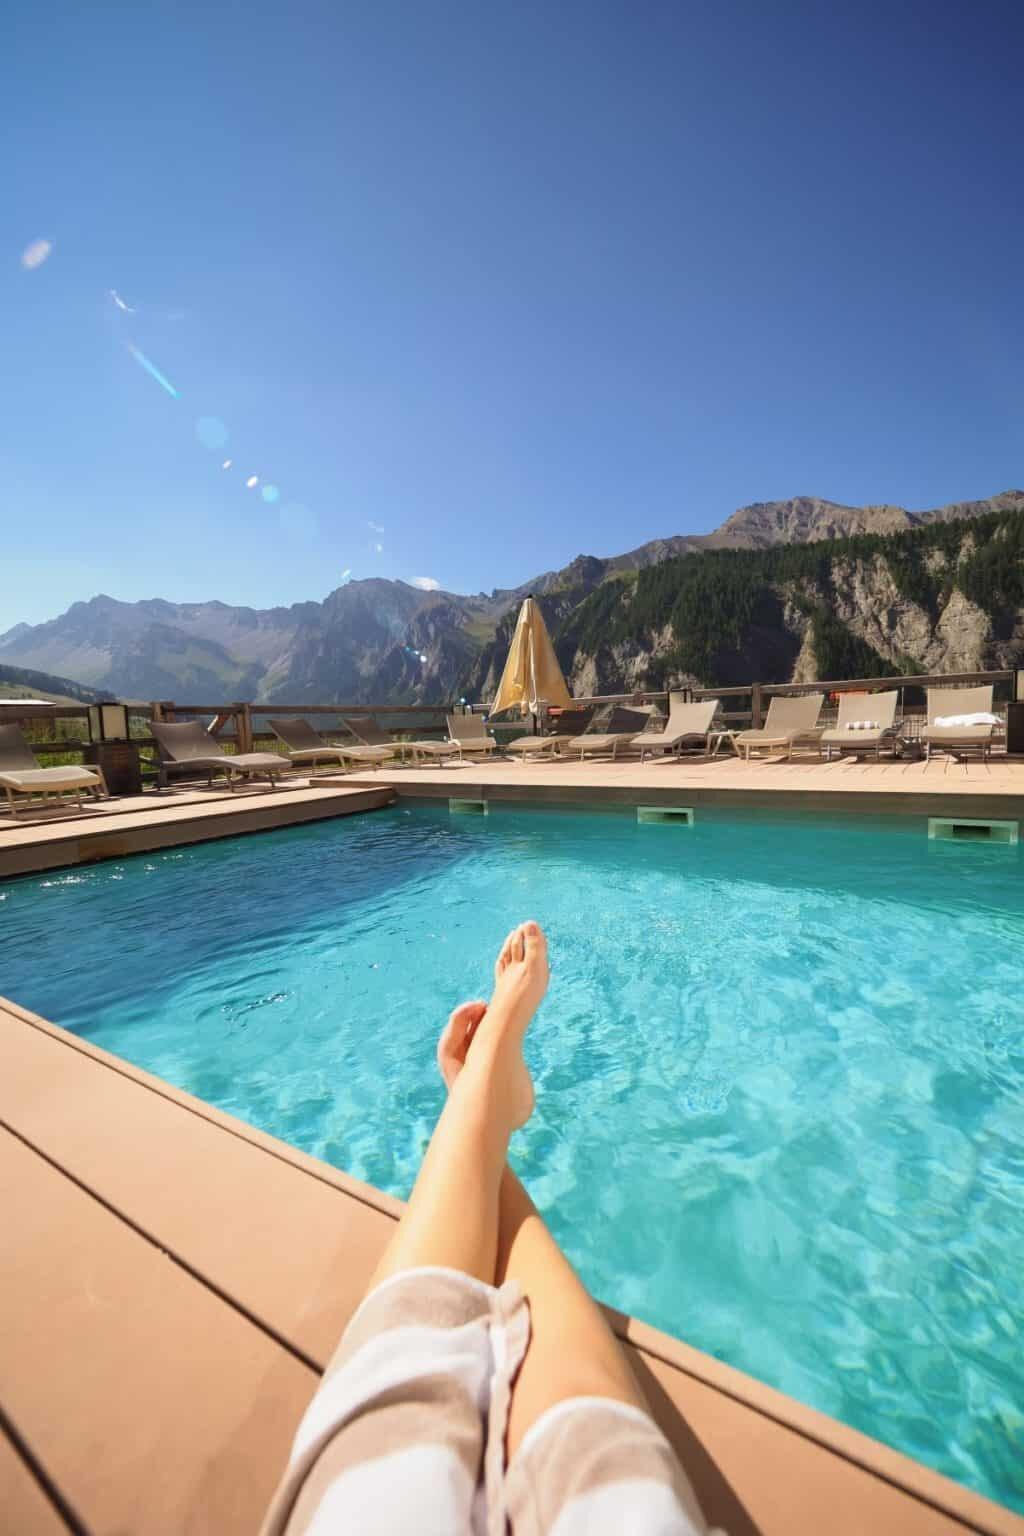 saint veran france europe 39 s highest village hotel alta peyra review the wandering lens. Black Bedroom Furniture Sets. Home Design Ideas